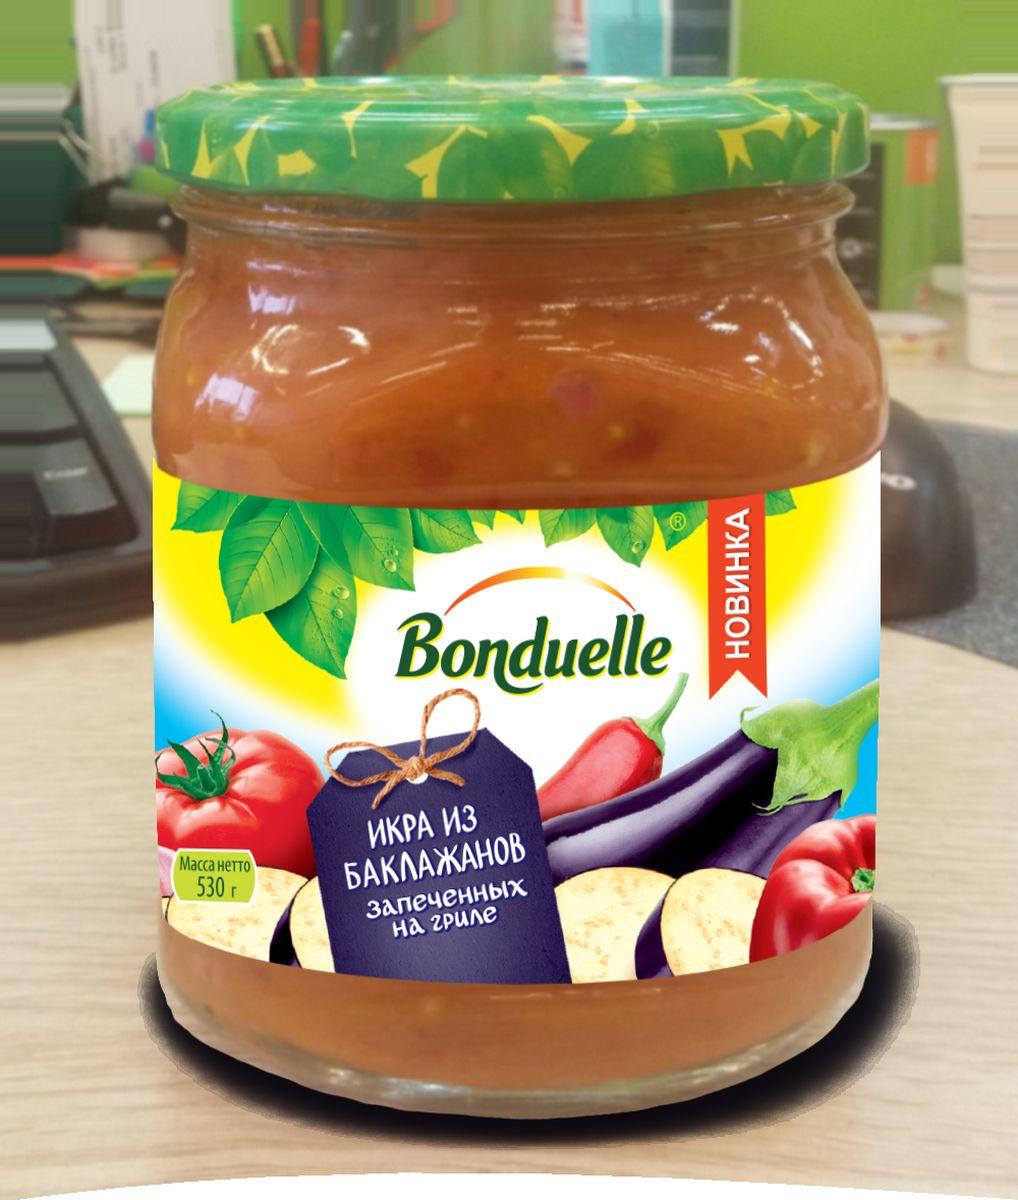 Bonduelle Икра овощная из баклажанов, 530 г дядя ваня икра из баклажанов по балкански 460 г